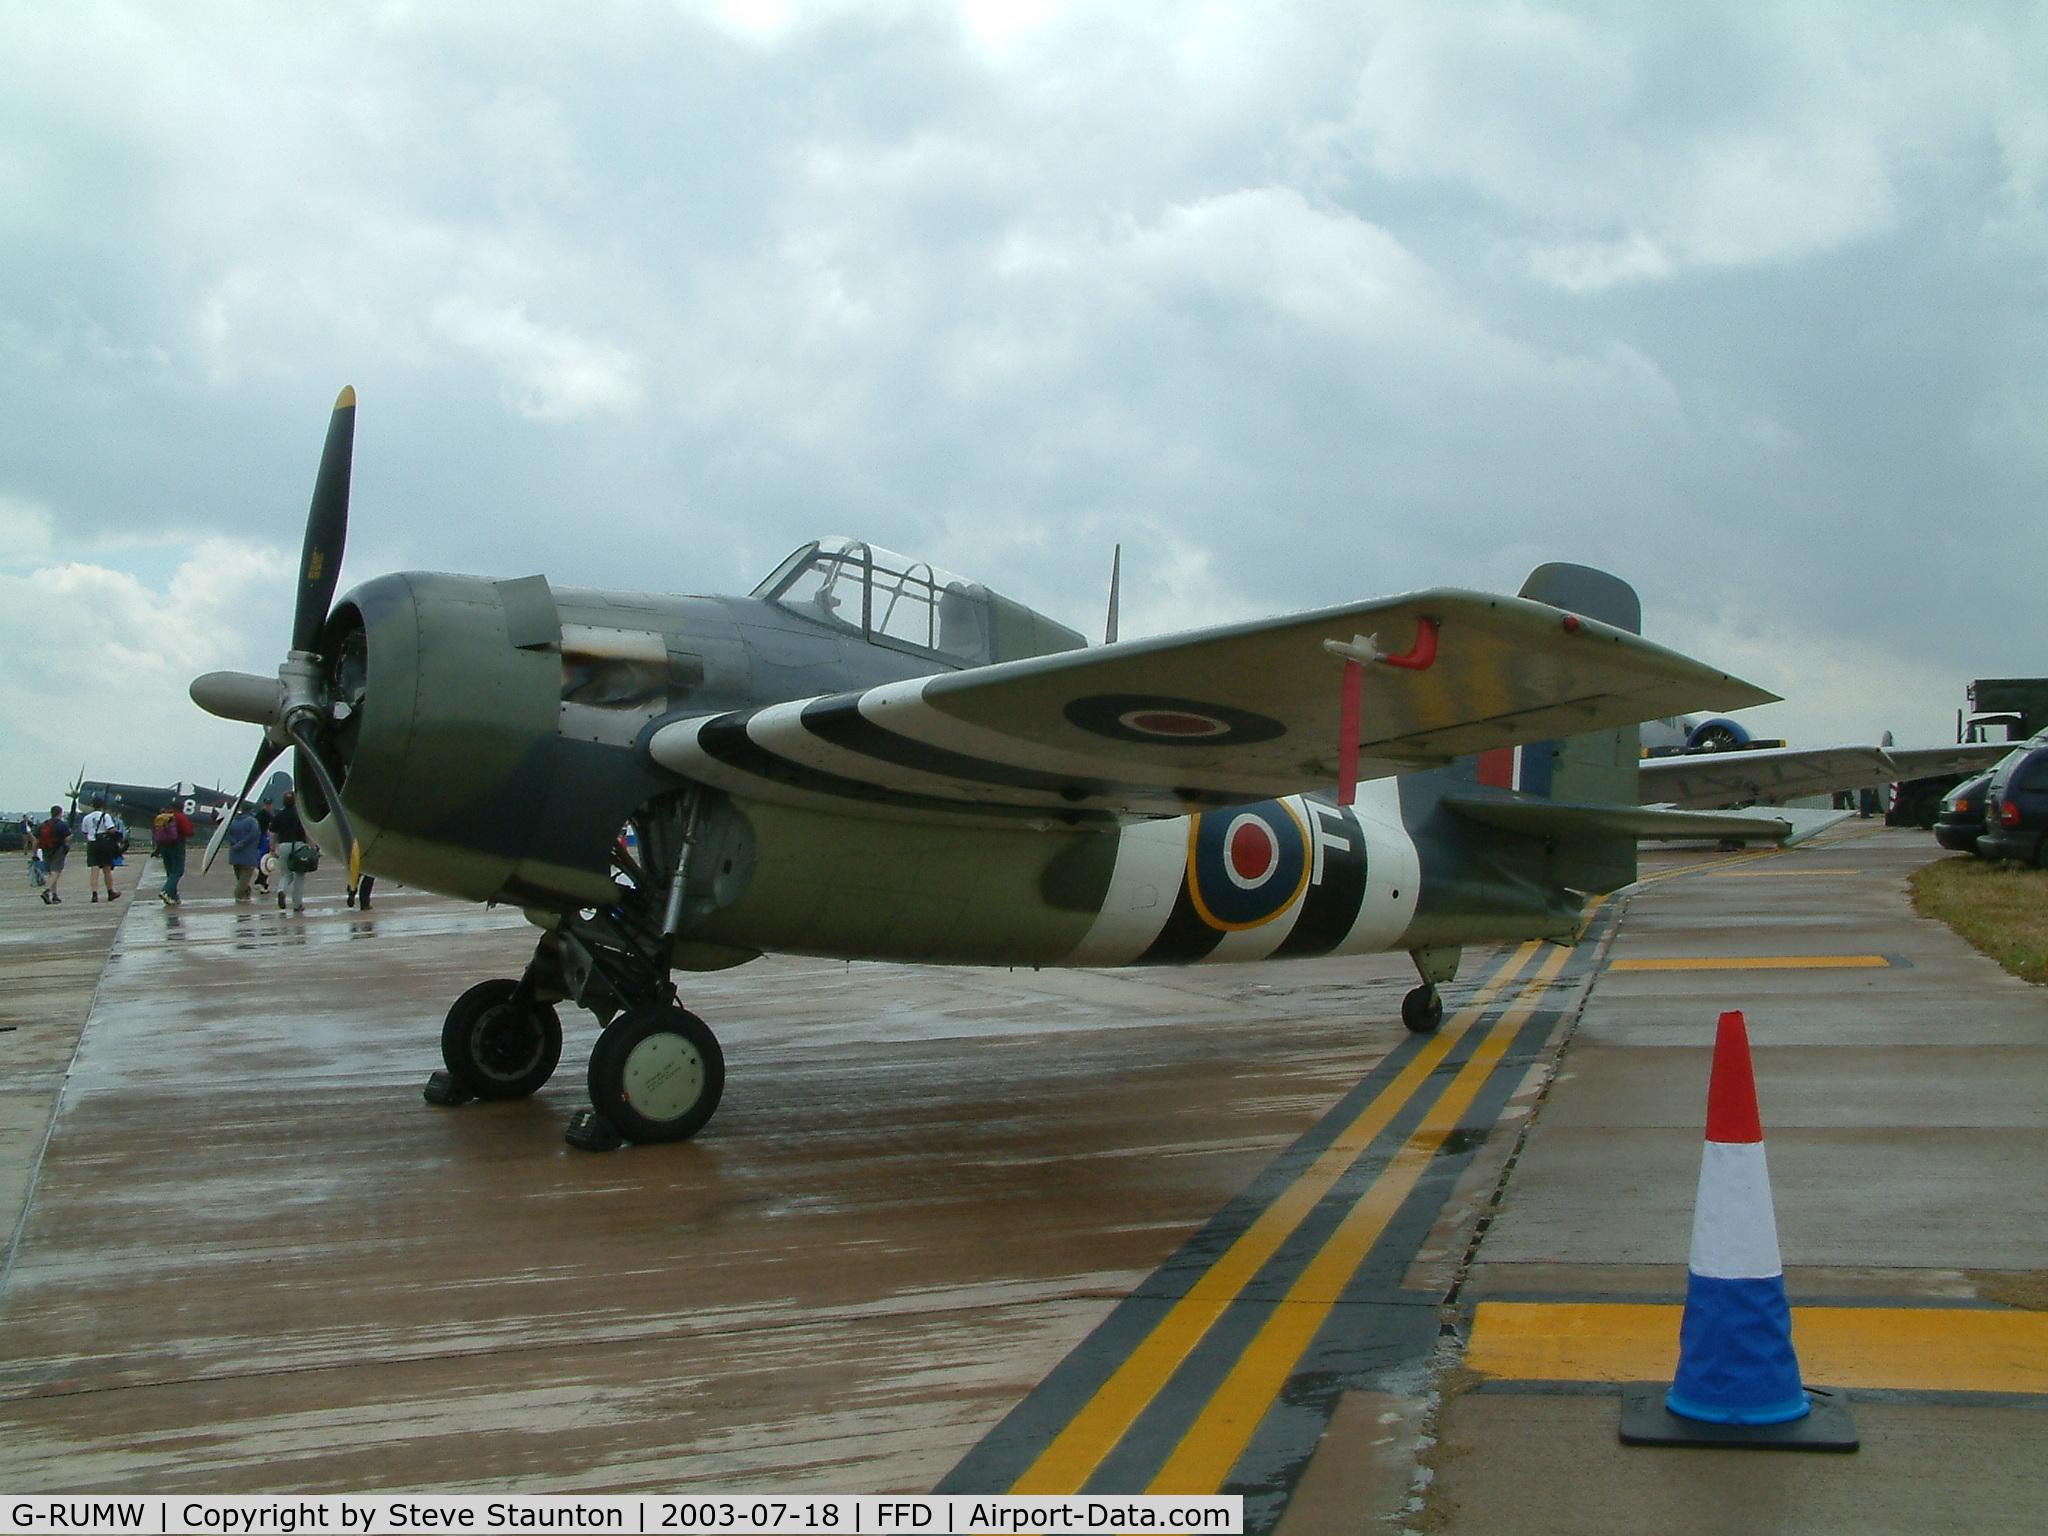 G-RUMW, 1944 General Motors (Grumman) FM-2 Wildcat C/N 5765, Royal International Air Tattoo 2003